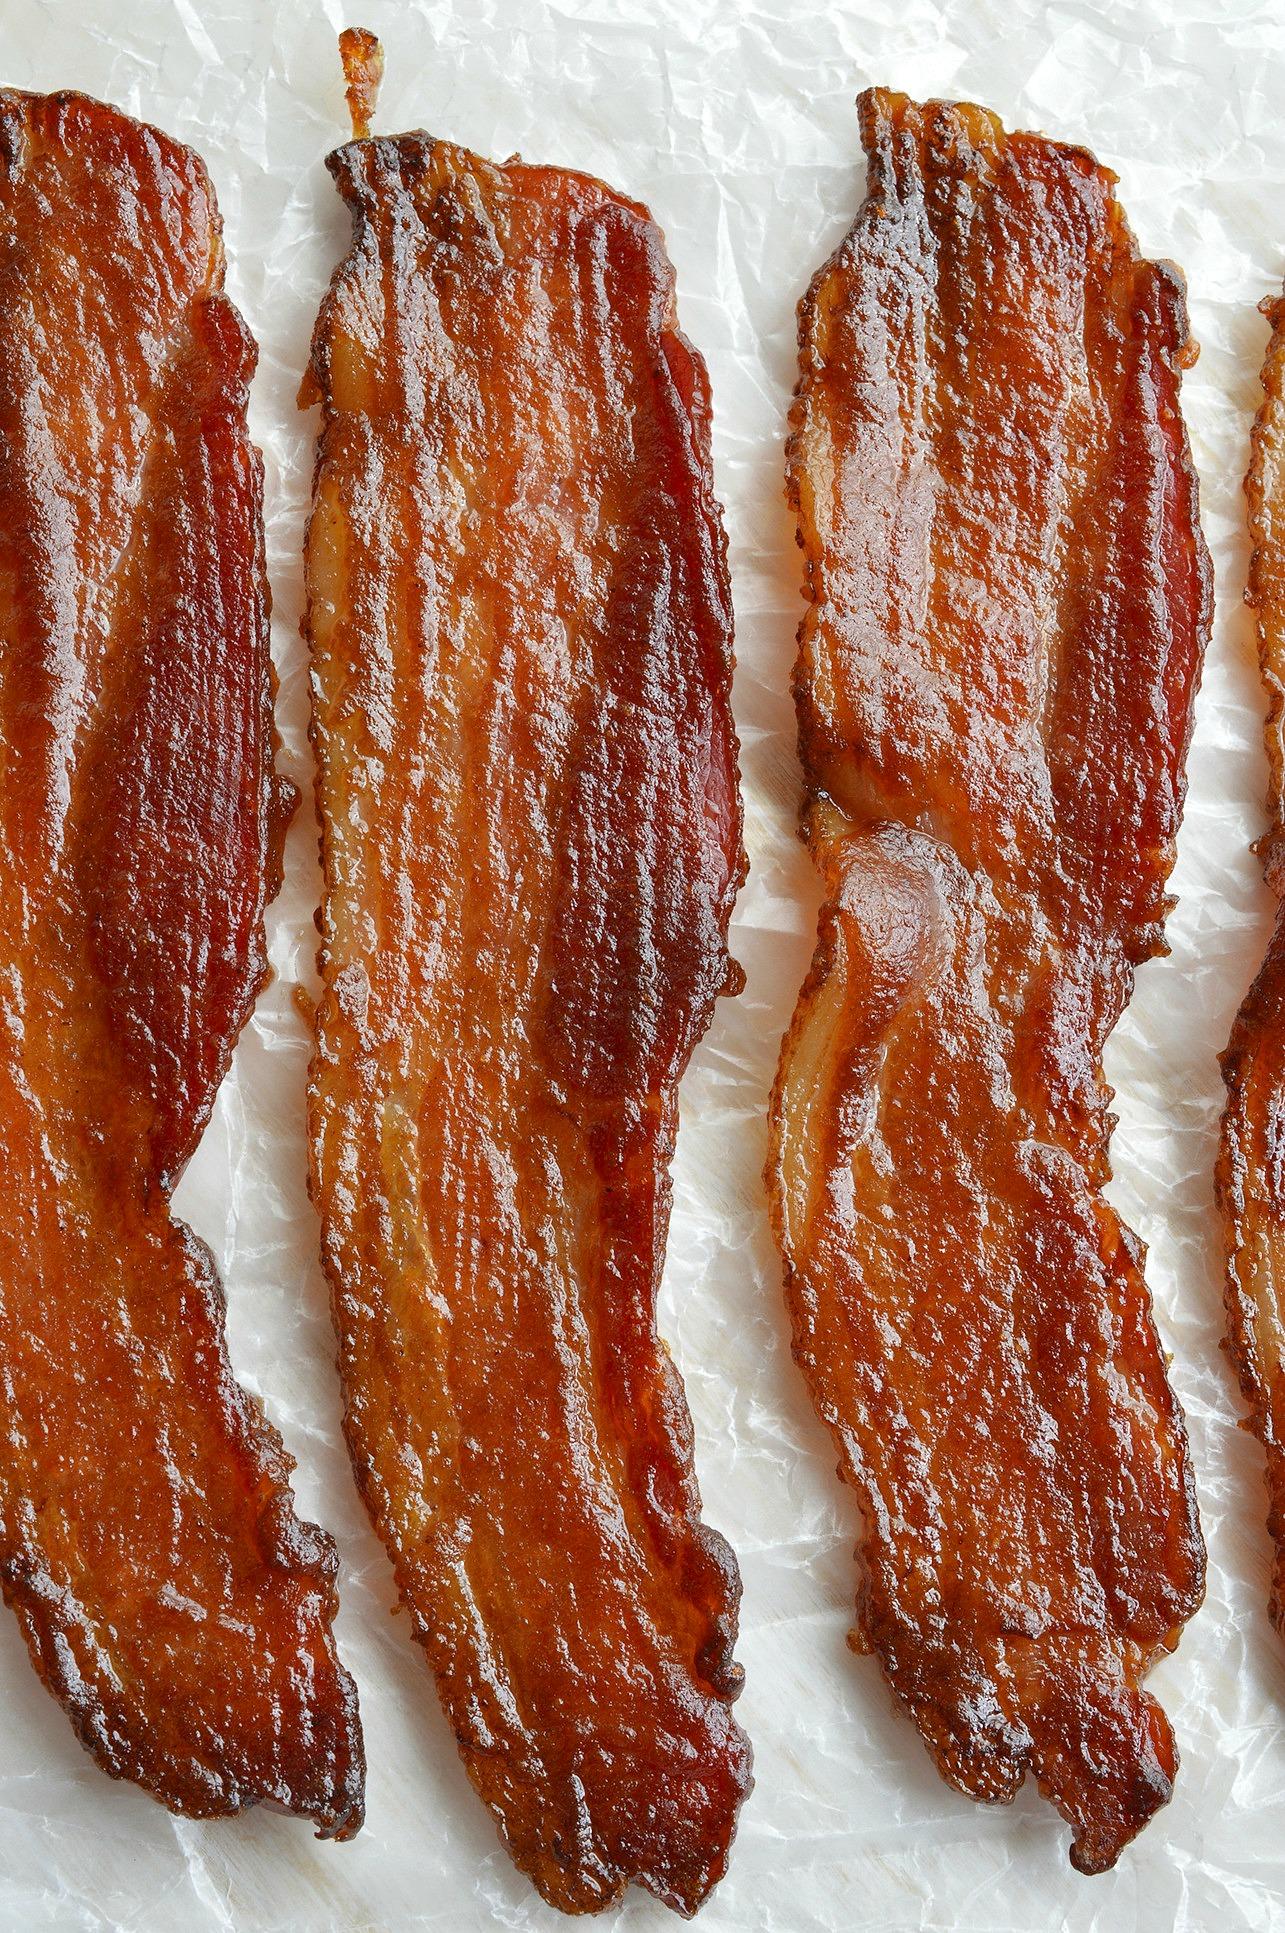 Candied Bacon Recipe - WonkyWonderful